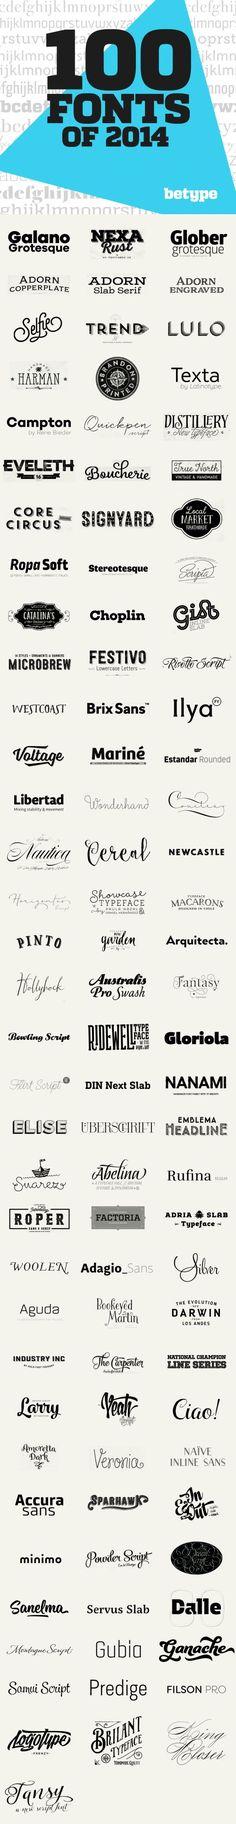 100 Best Fonts of 2014 via http://fontsoftheyear.com: